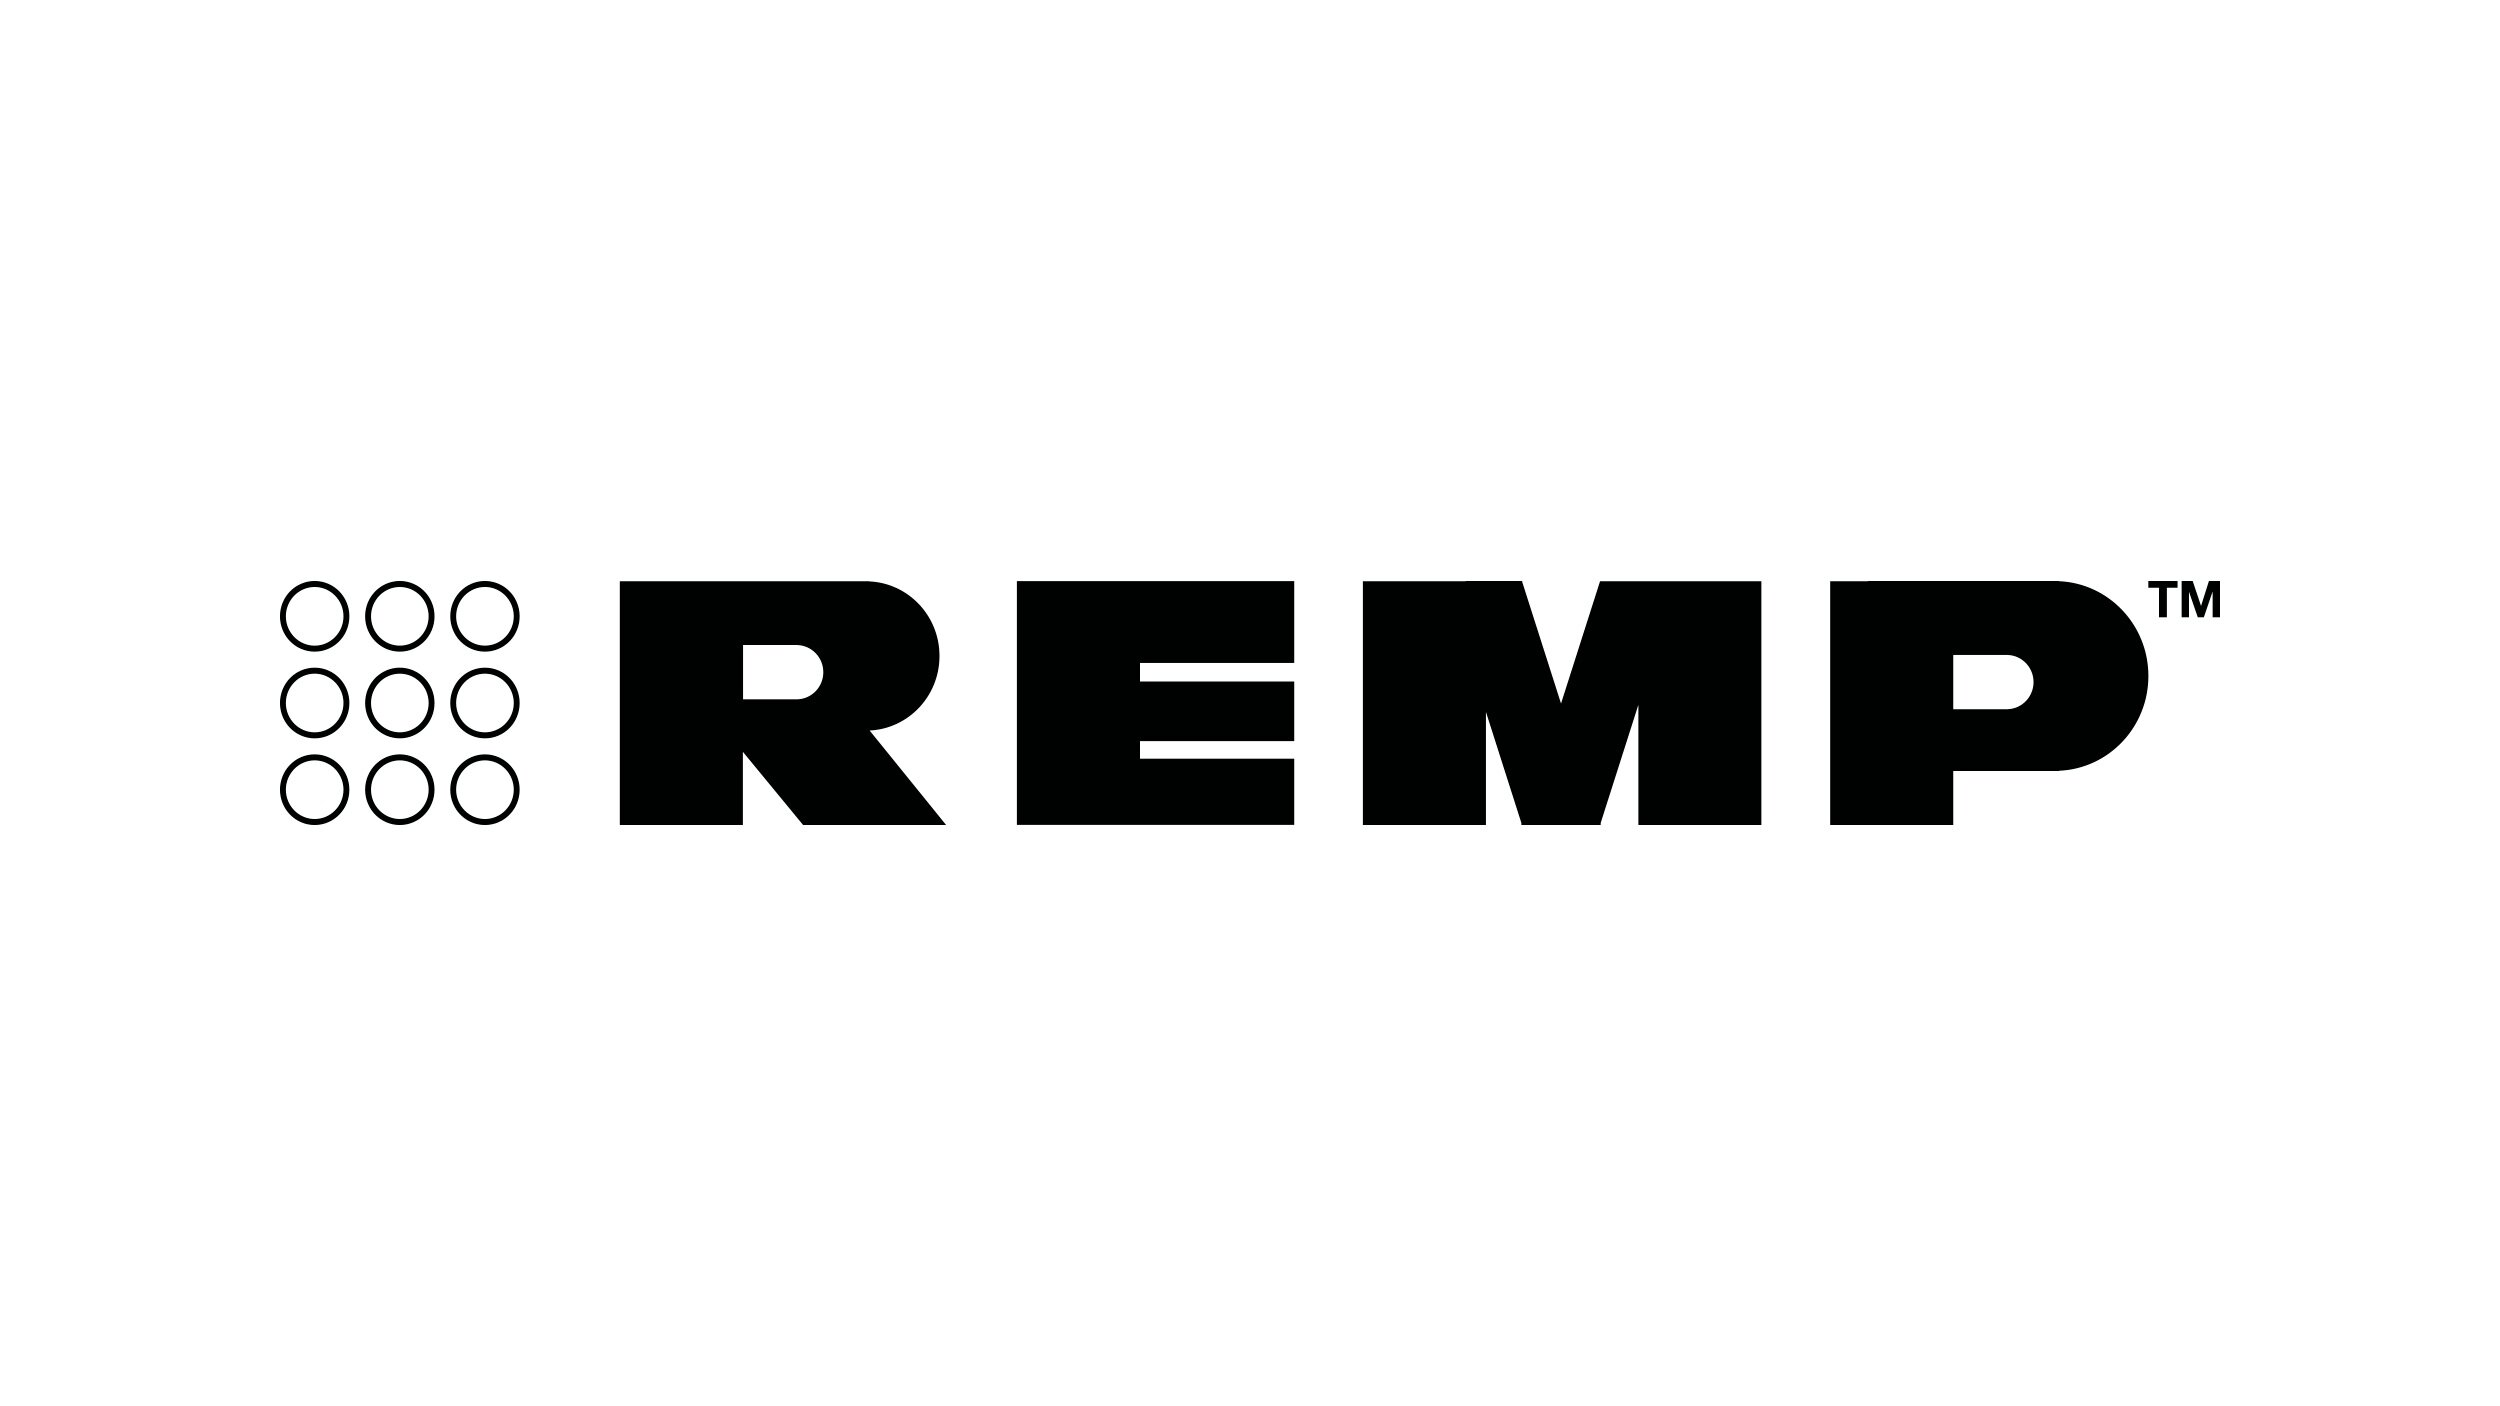 remp-logo.jpg